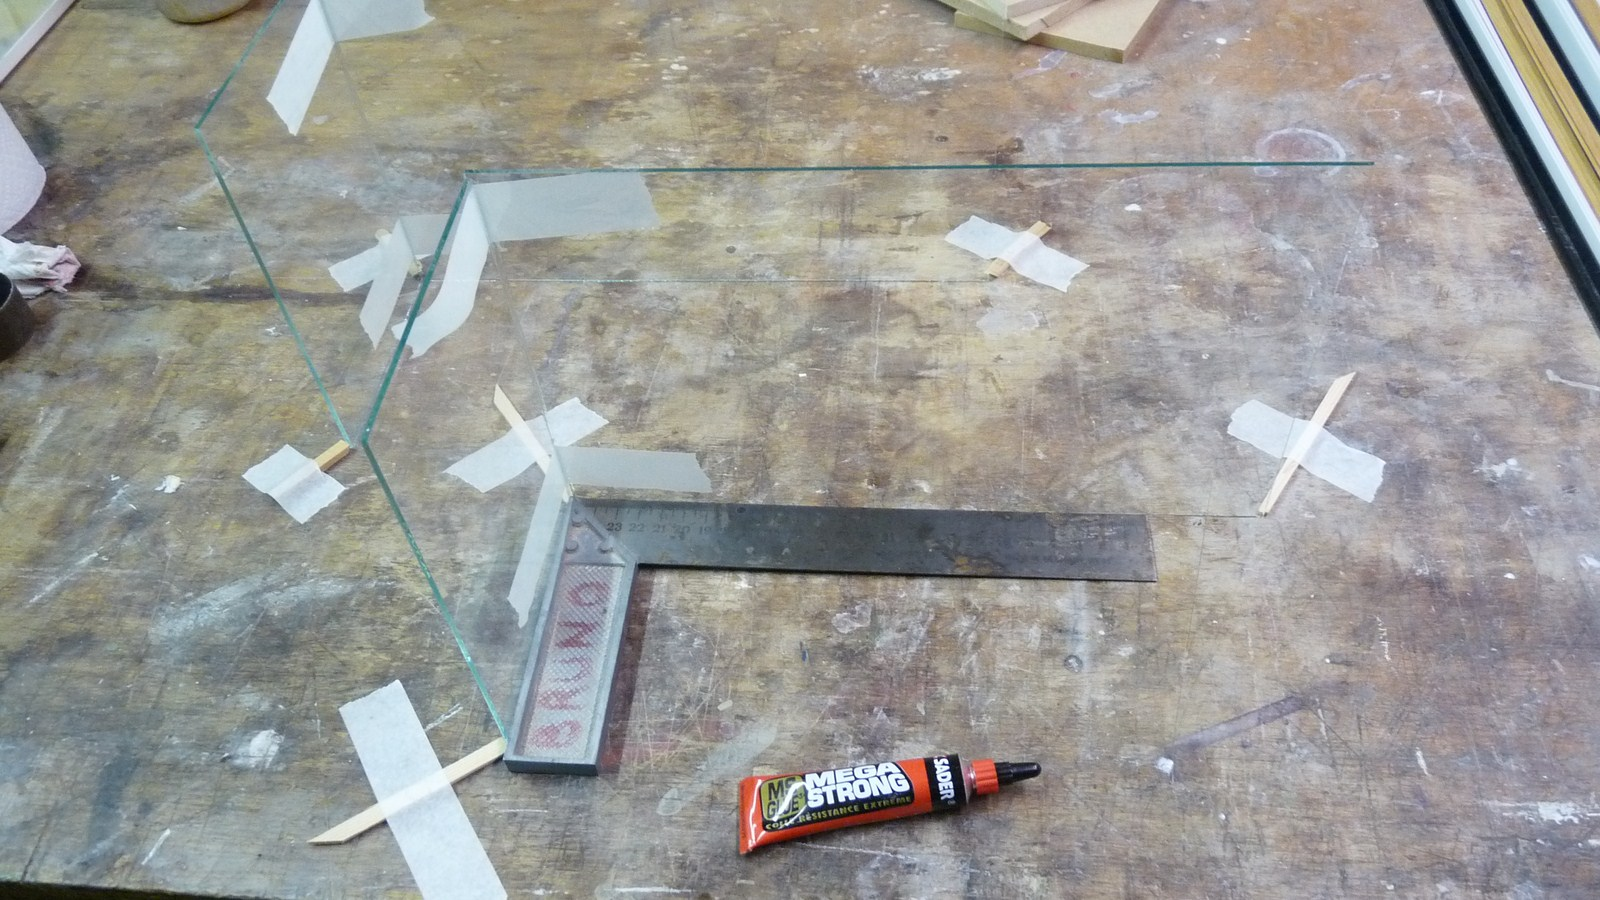 Fabriquer ses propres vitrines en verre 17071907263523134915156546